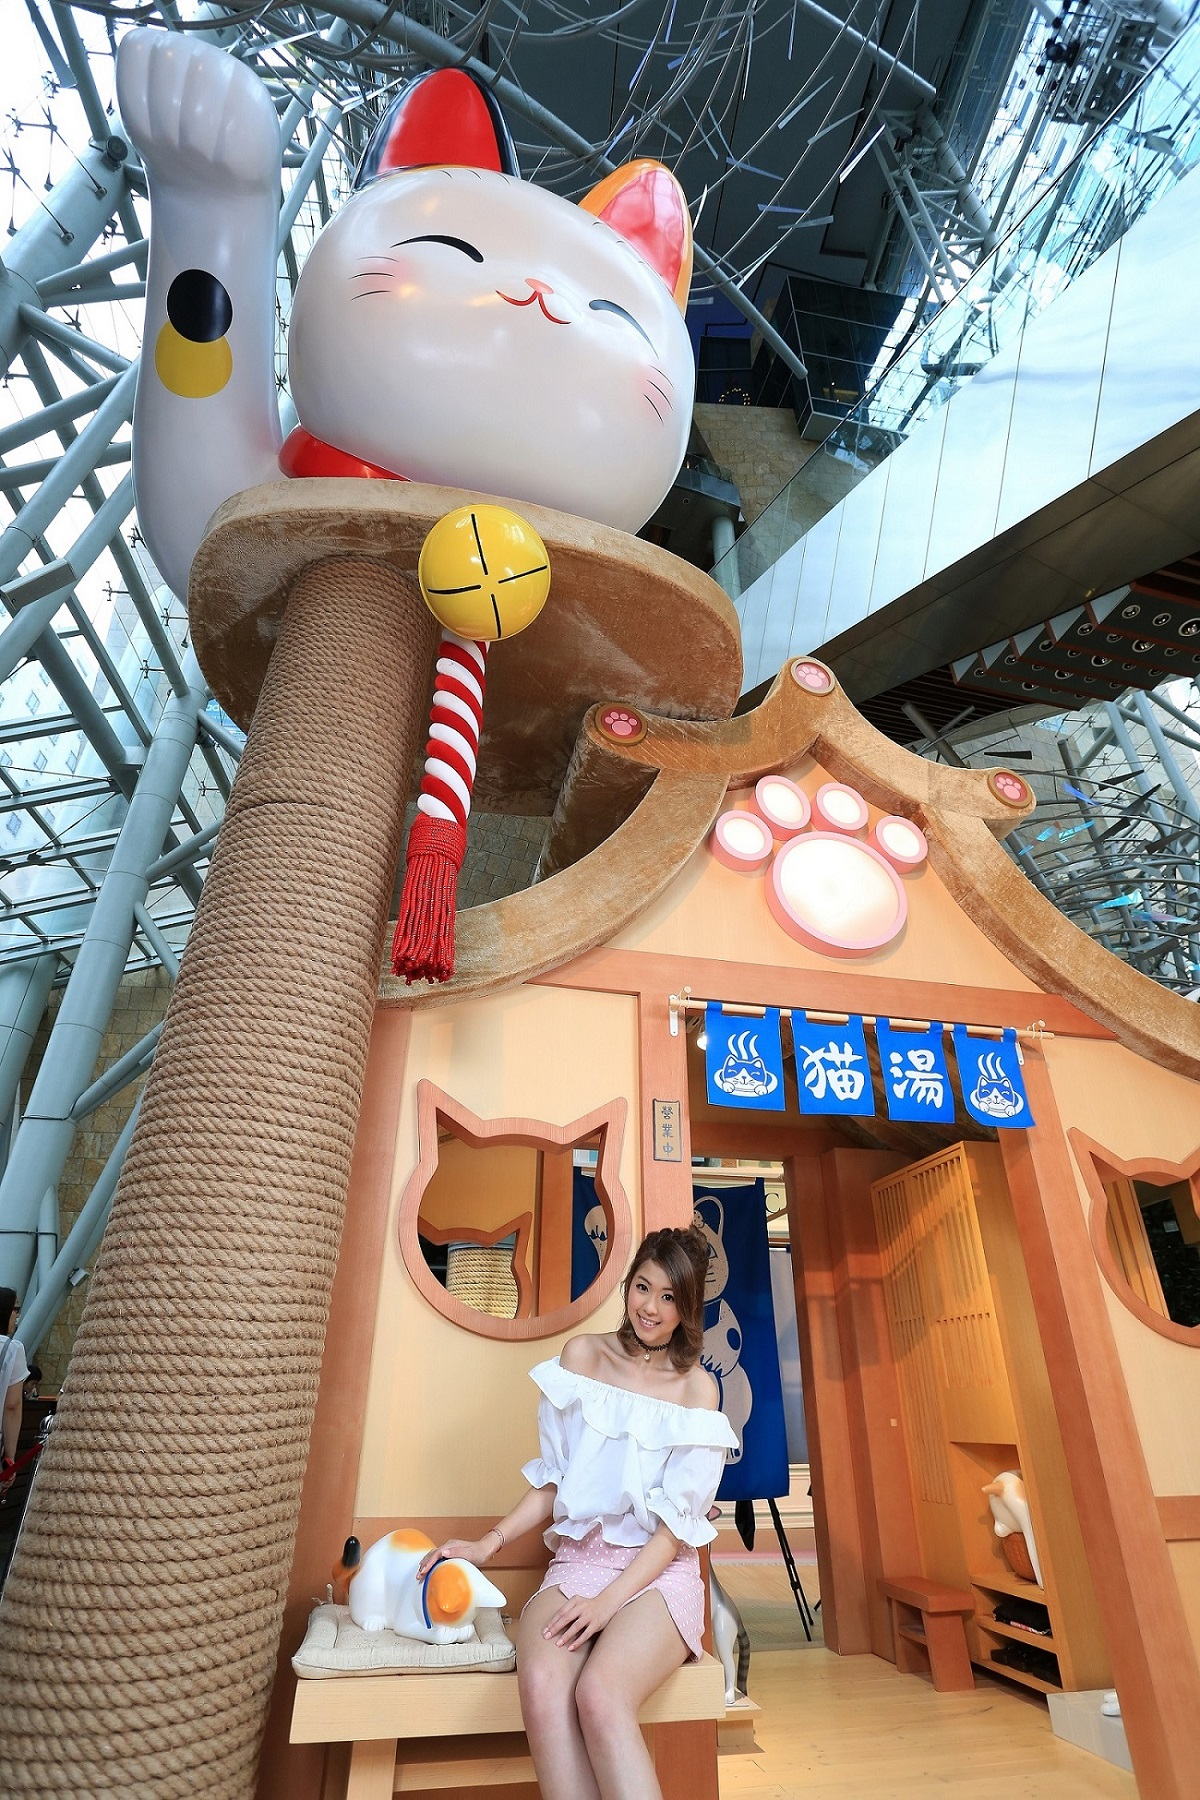 朗豪坊_HappyMEOWment 喵民遊樂園_日式貓湯--Langham-place-mk-hk-mall-summer-cat-cafe-meowshop-cat-satoruko-higemanju